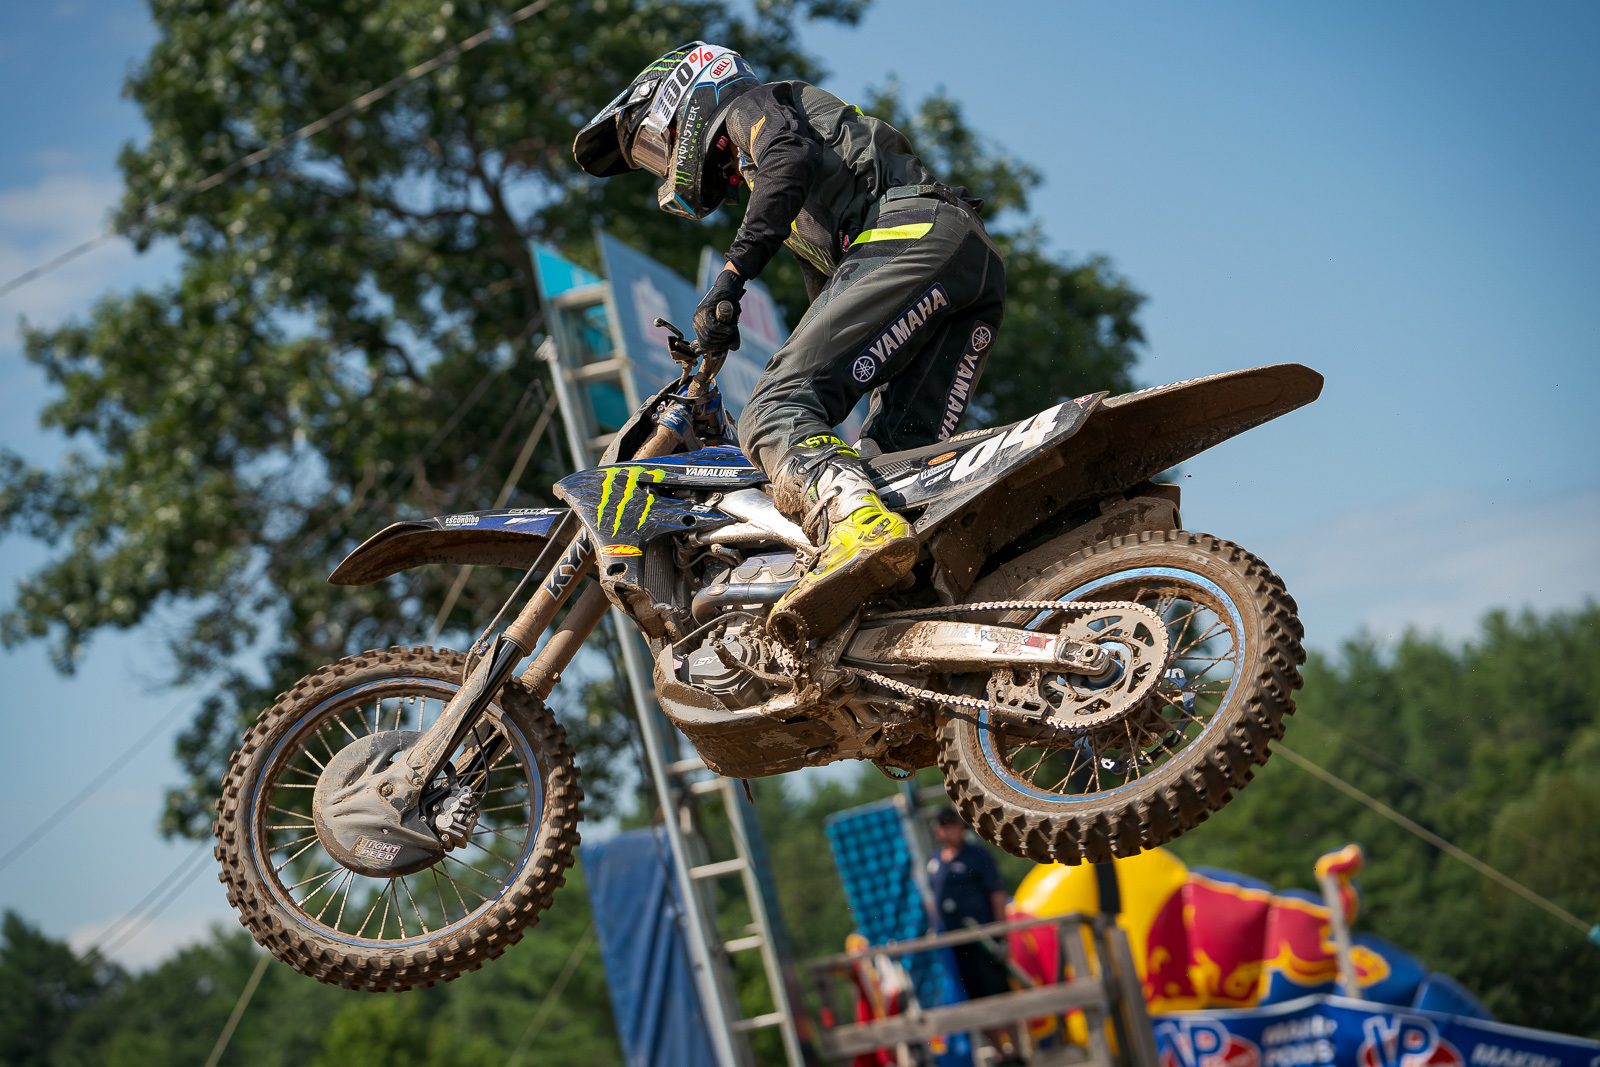 2021-SOUTHWICK-MOTOCROSS-KICKSTART_0968